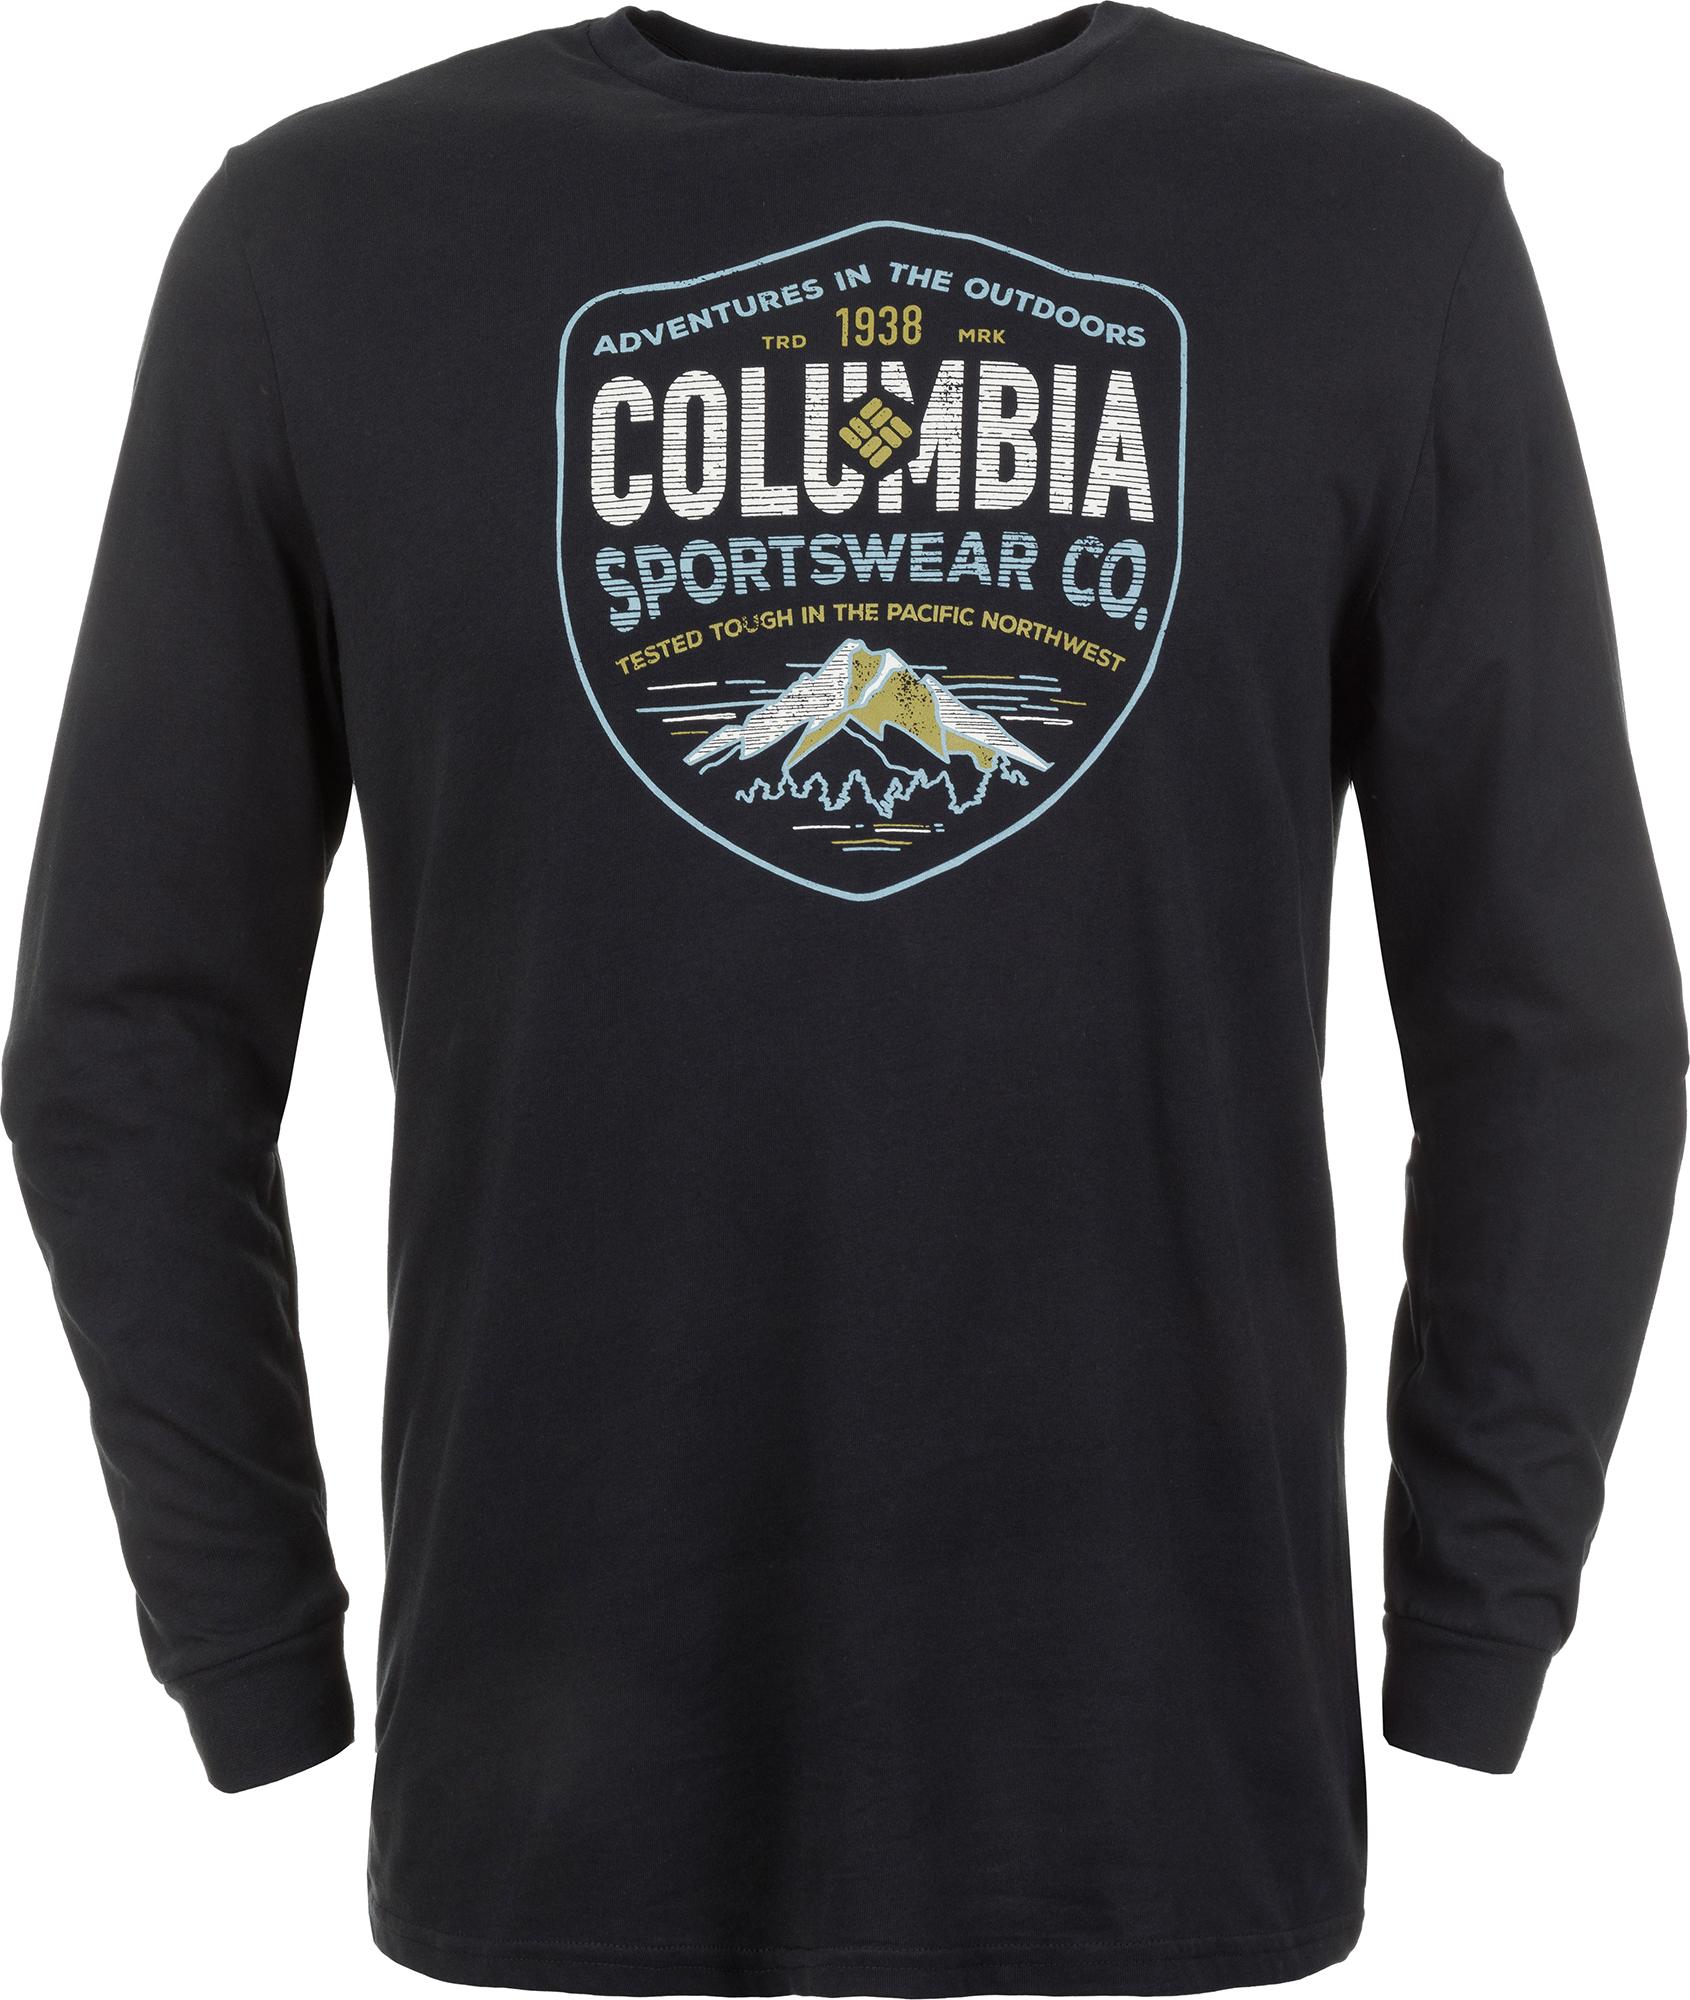 Columbia Футболка с длинным рукавом мужская Columbia Rugged Shield, размер 48-50